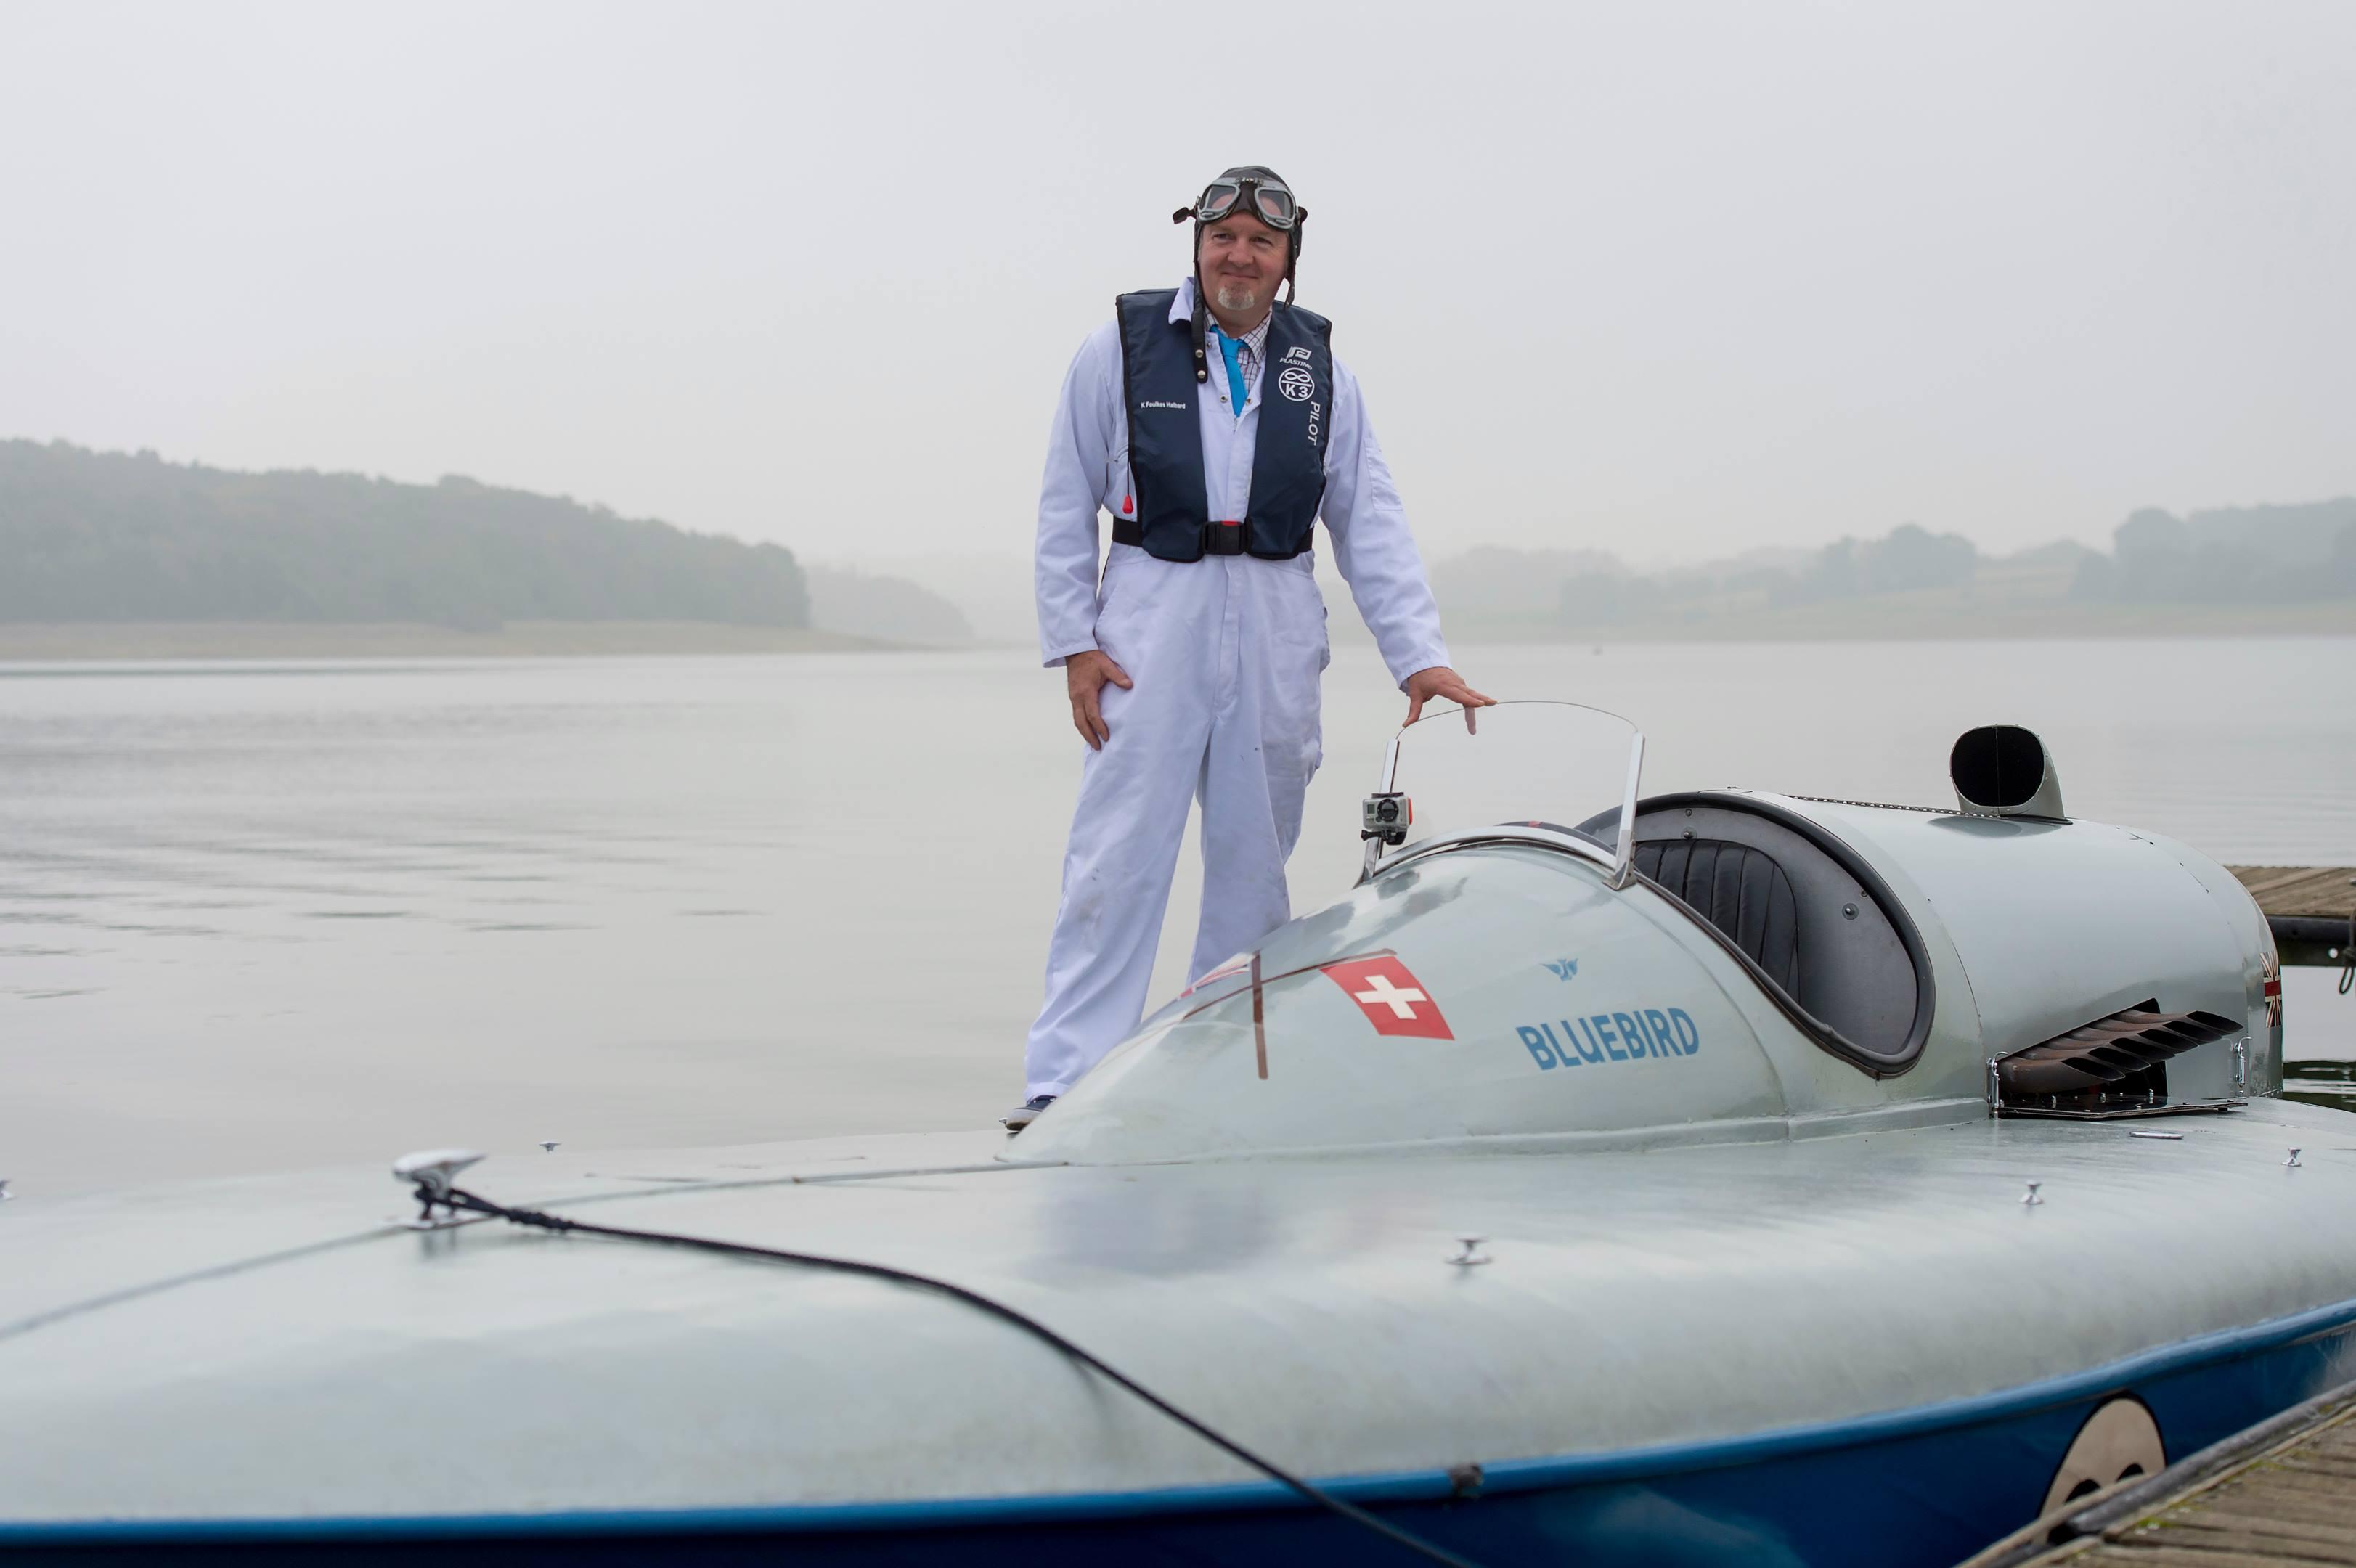 Blue Bird K3 on the water